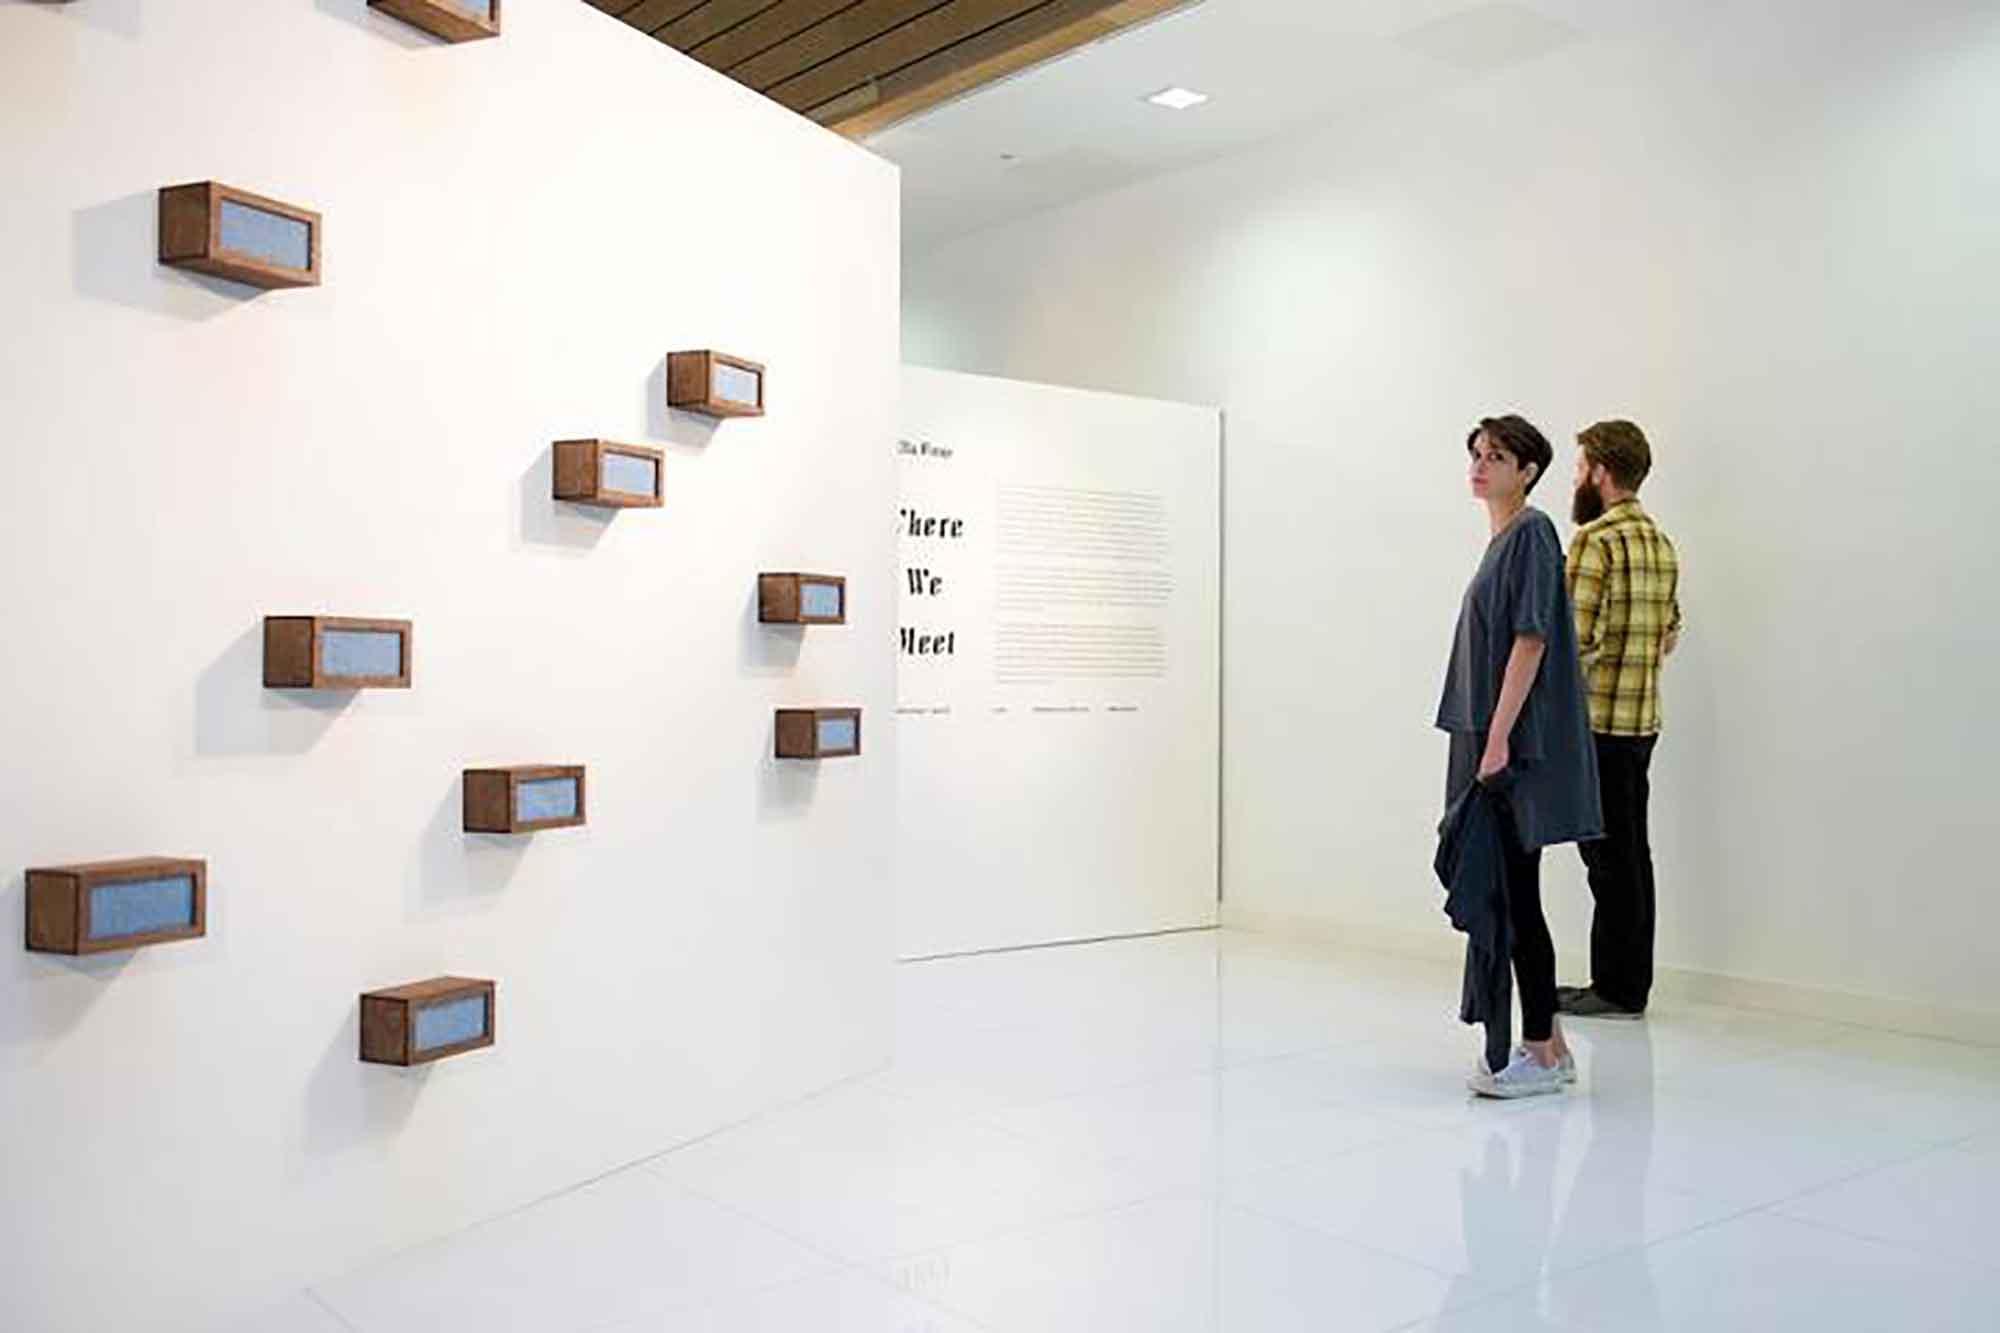 Ella Finer, Where we Meet, October 2012, Galerie8, London. Photograph Credit: Kitty Walker